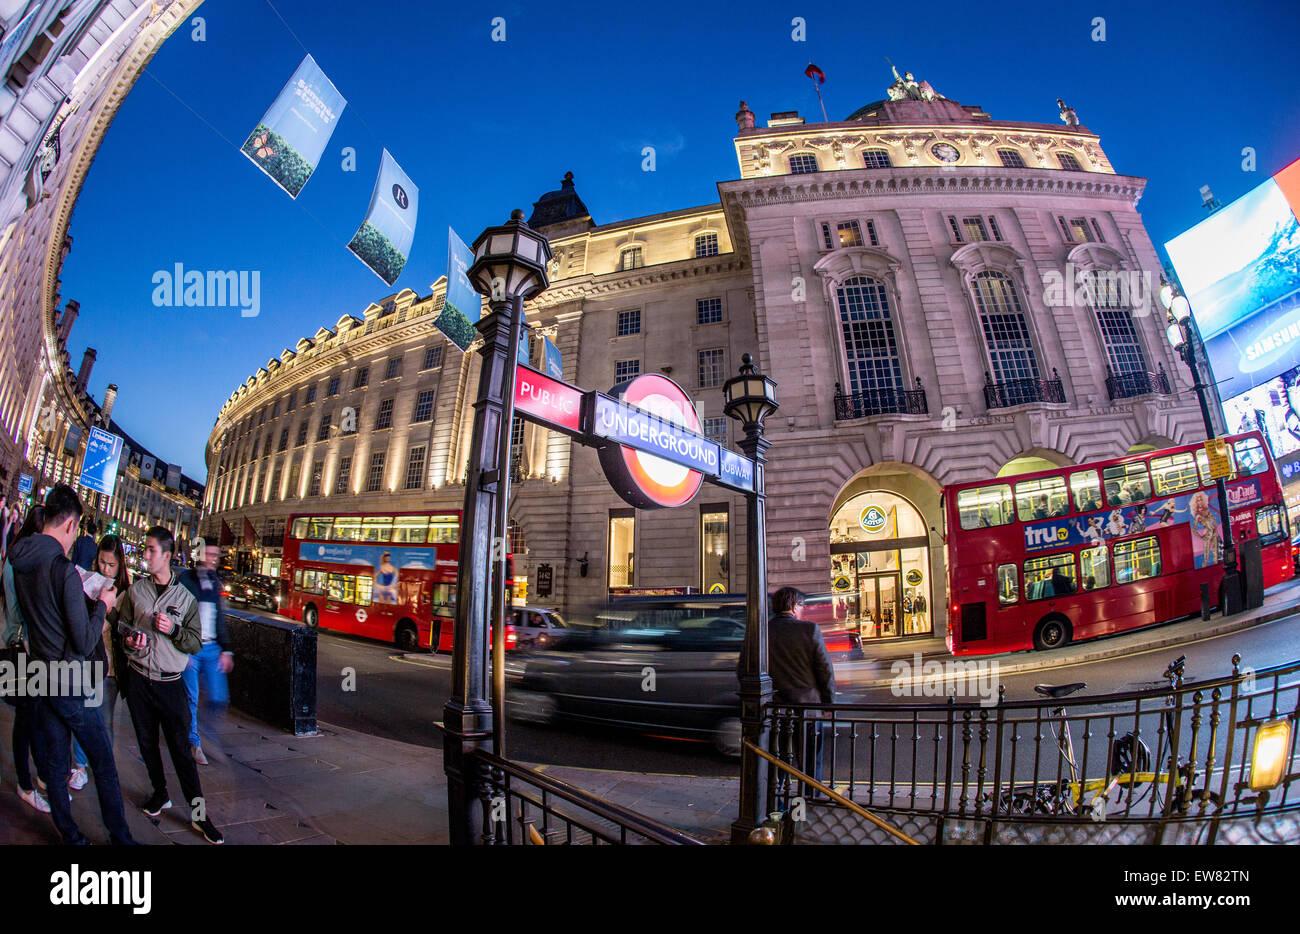 Piccadilly Circus Underground Station Entrance  at Night London UK - Stock Image